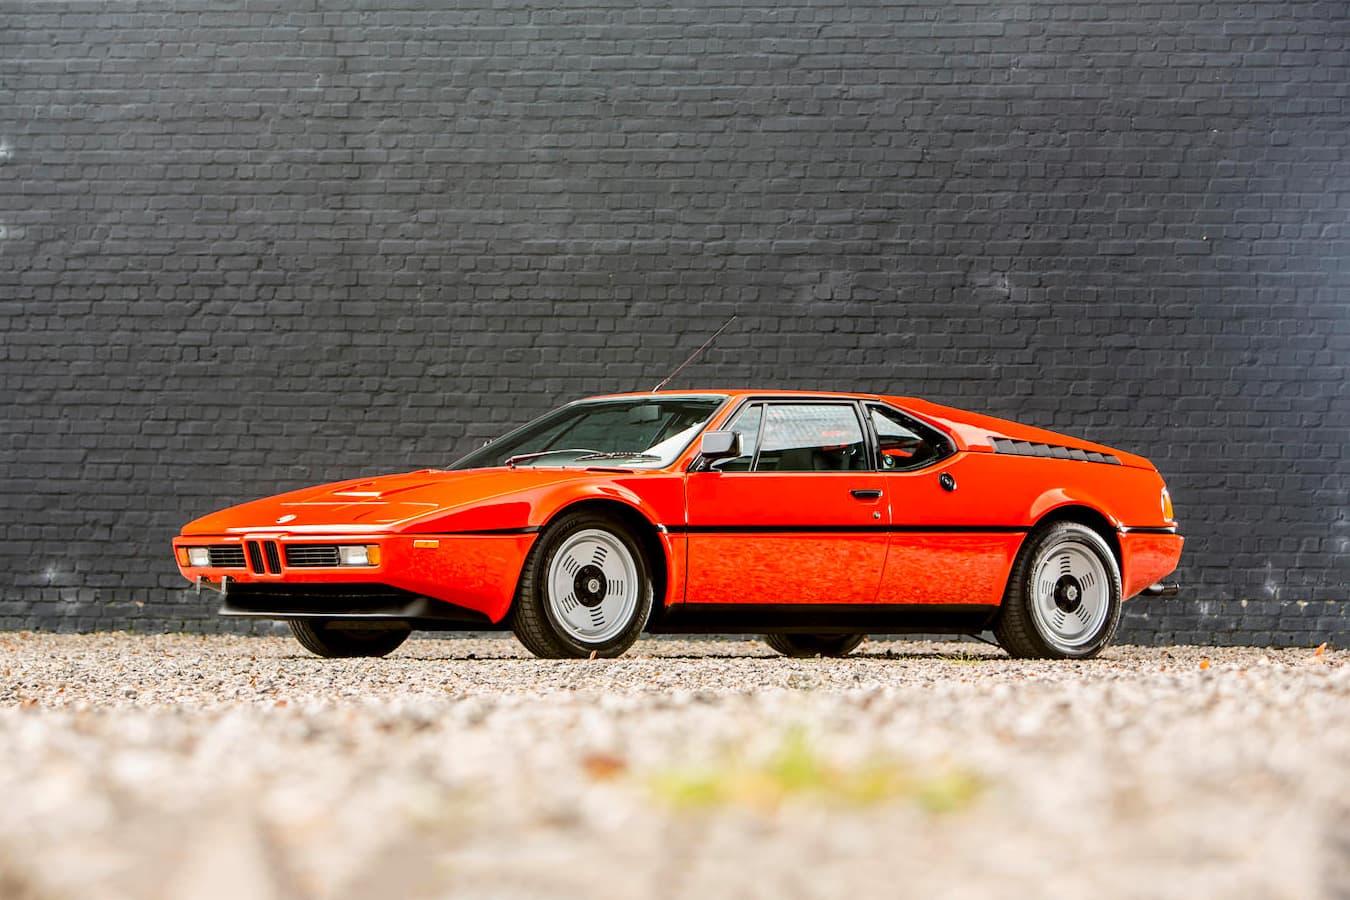 Bmw M1 Orange Classic Coupe 1980 Auction Hypebeast